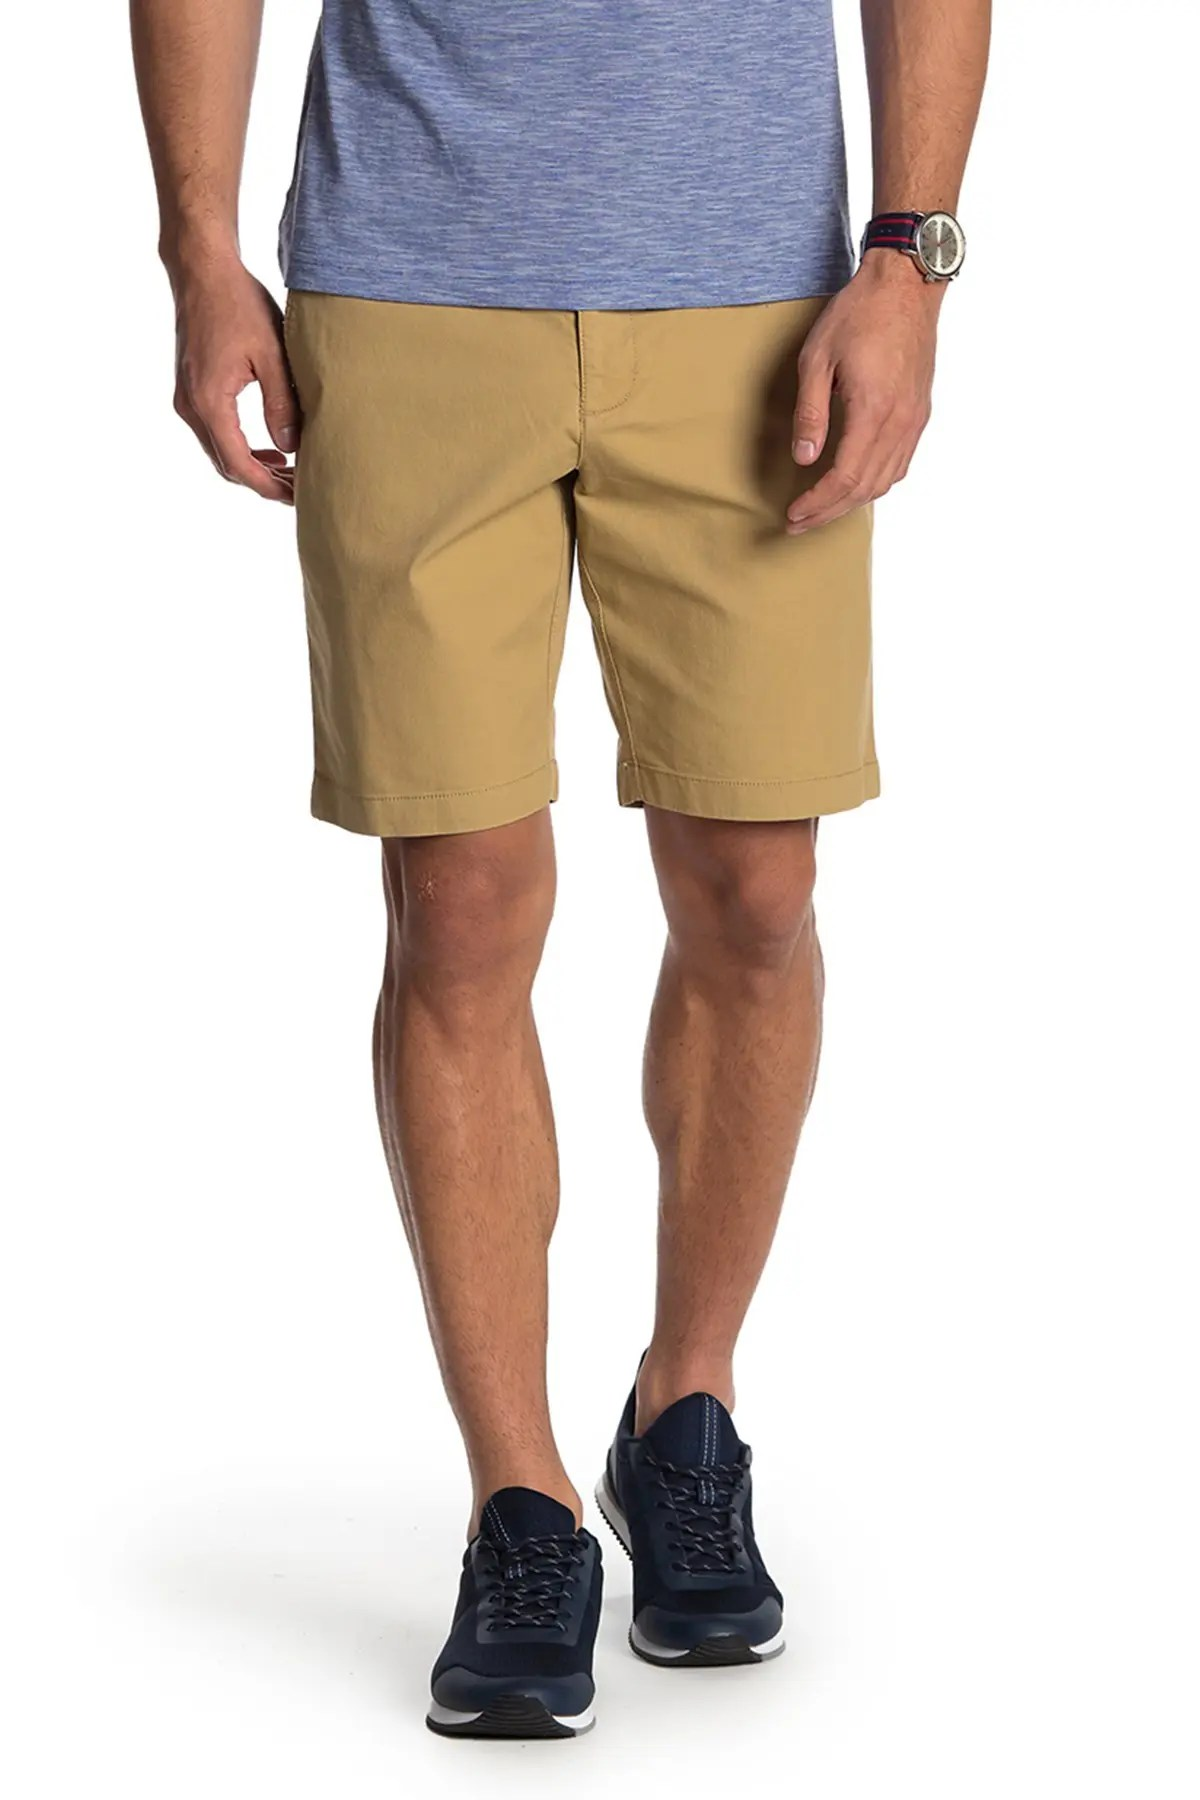 original penguin shorts for men